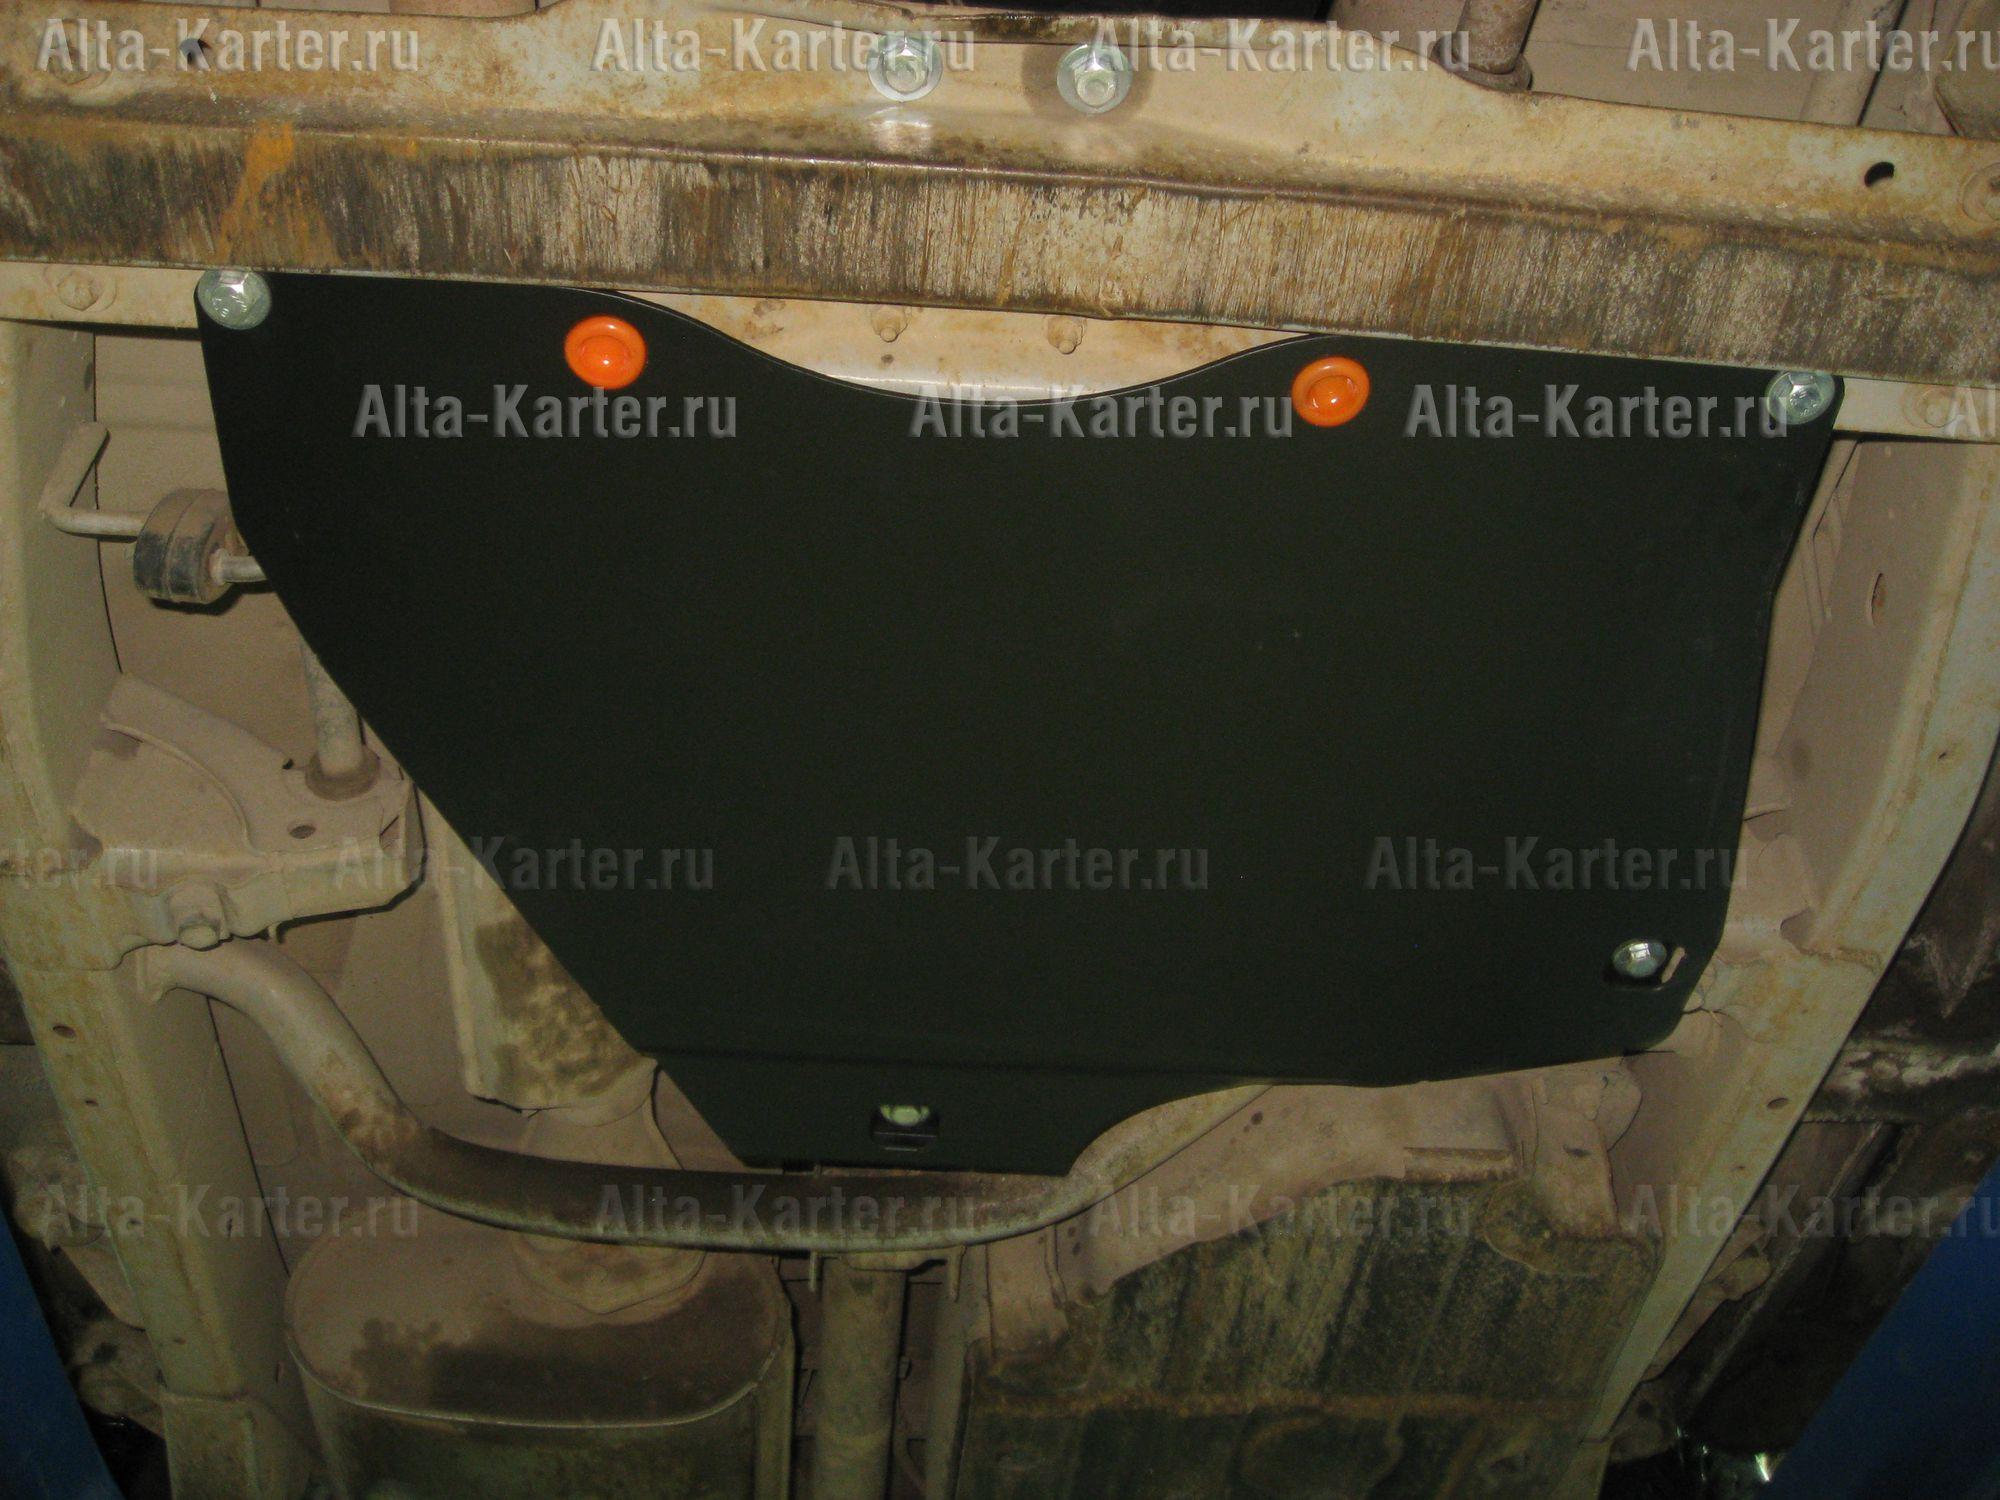 Защита Alfeco для раздатки Tager 2008-2012. Артикул ALF.32.07